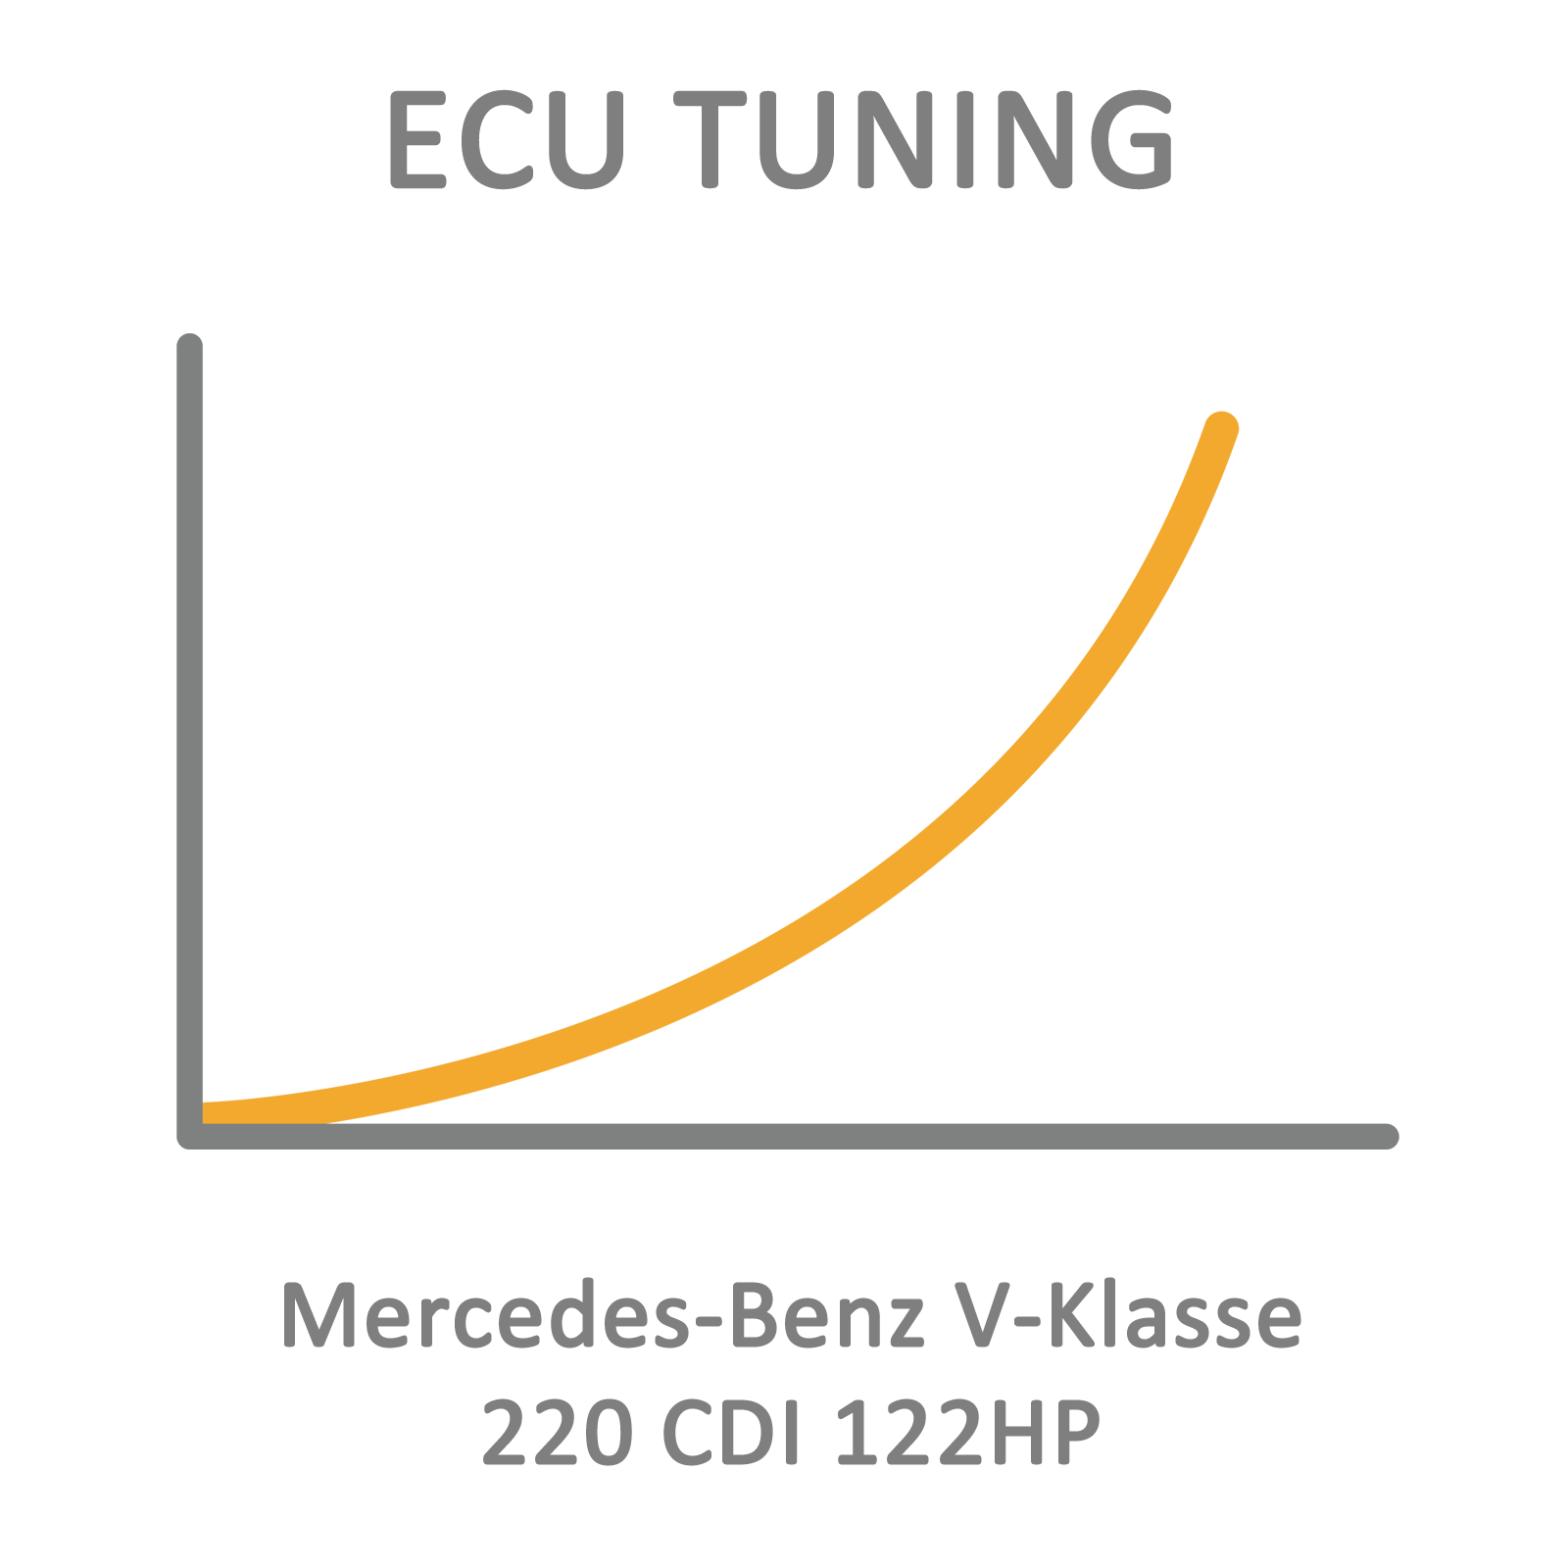 Mercedes-Benz V-Klasse 220 CDI 122HP ECU Tuning Remapping